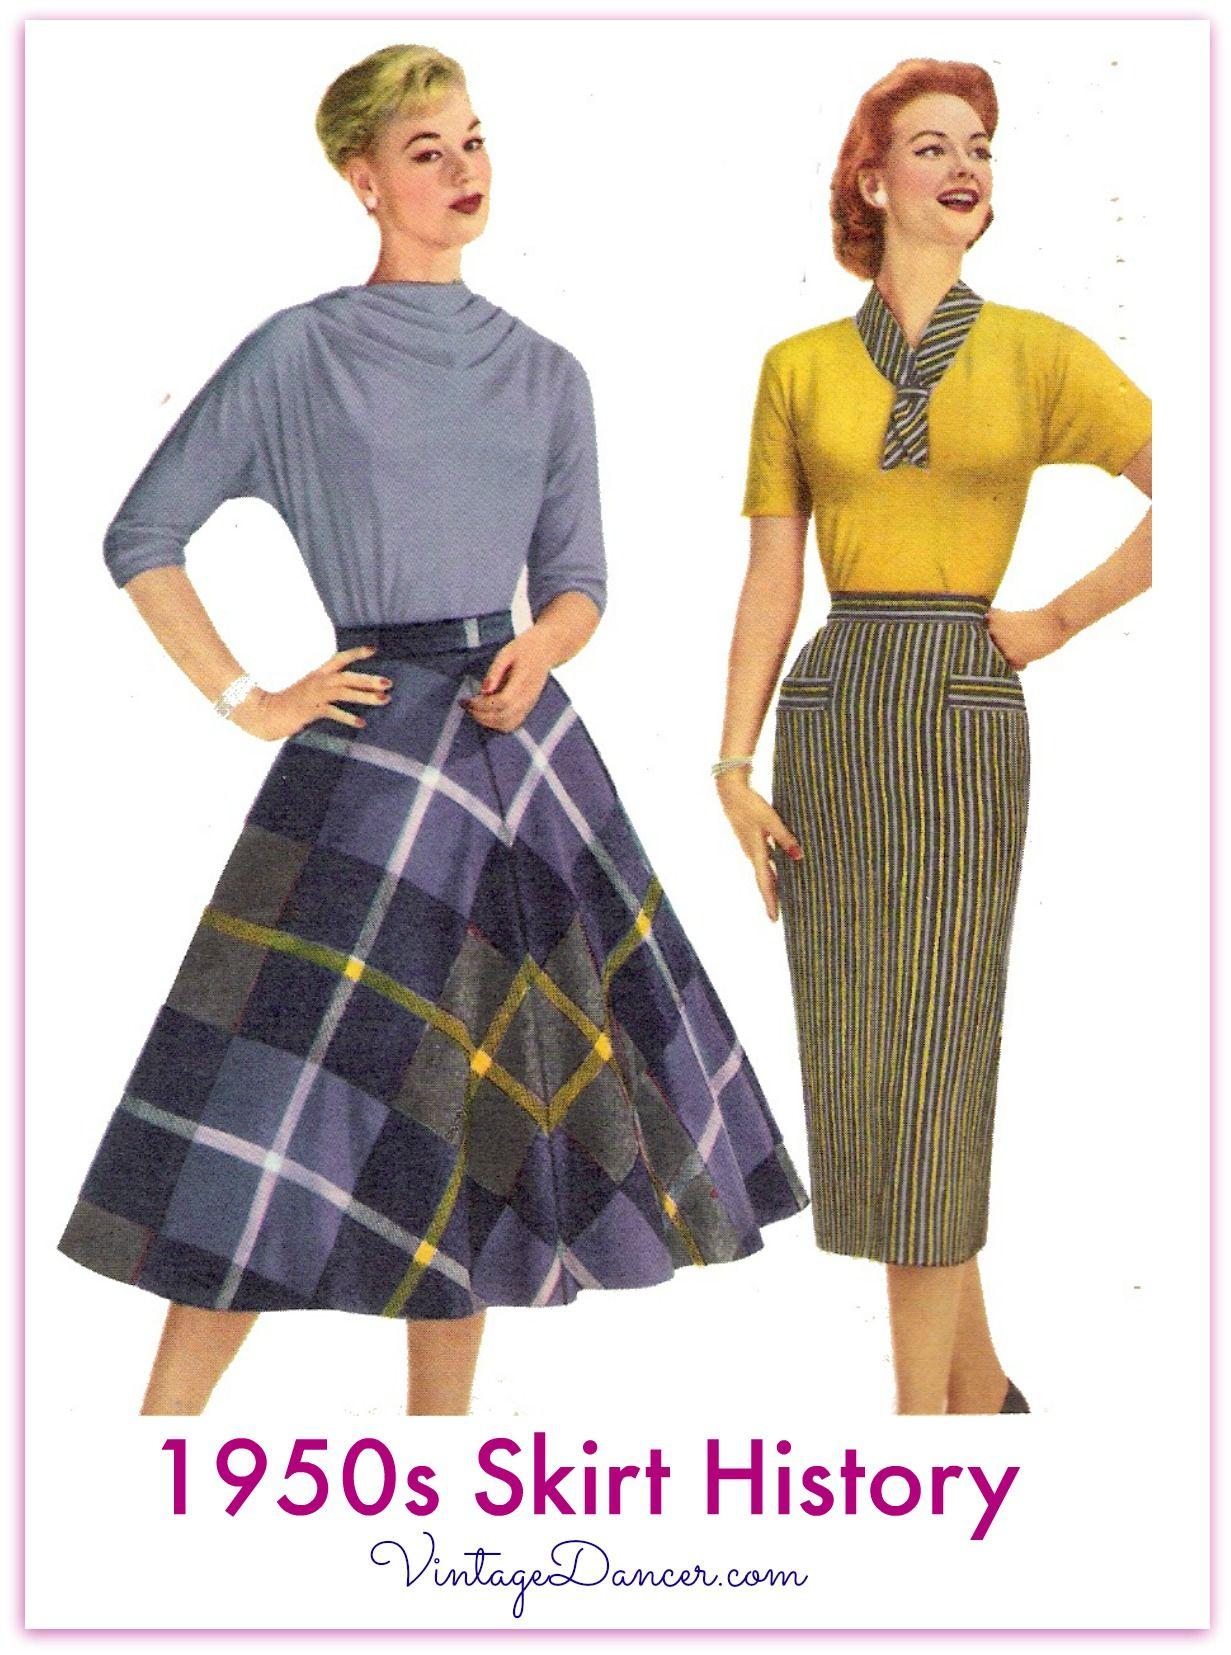 1950s Skirt Styles History | 1950s fashion | Skirt fashion ...